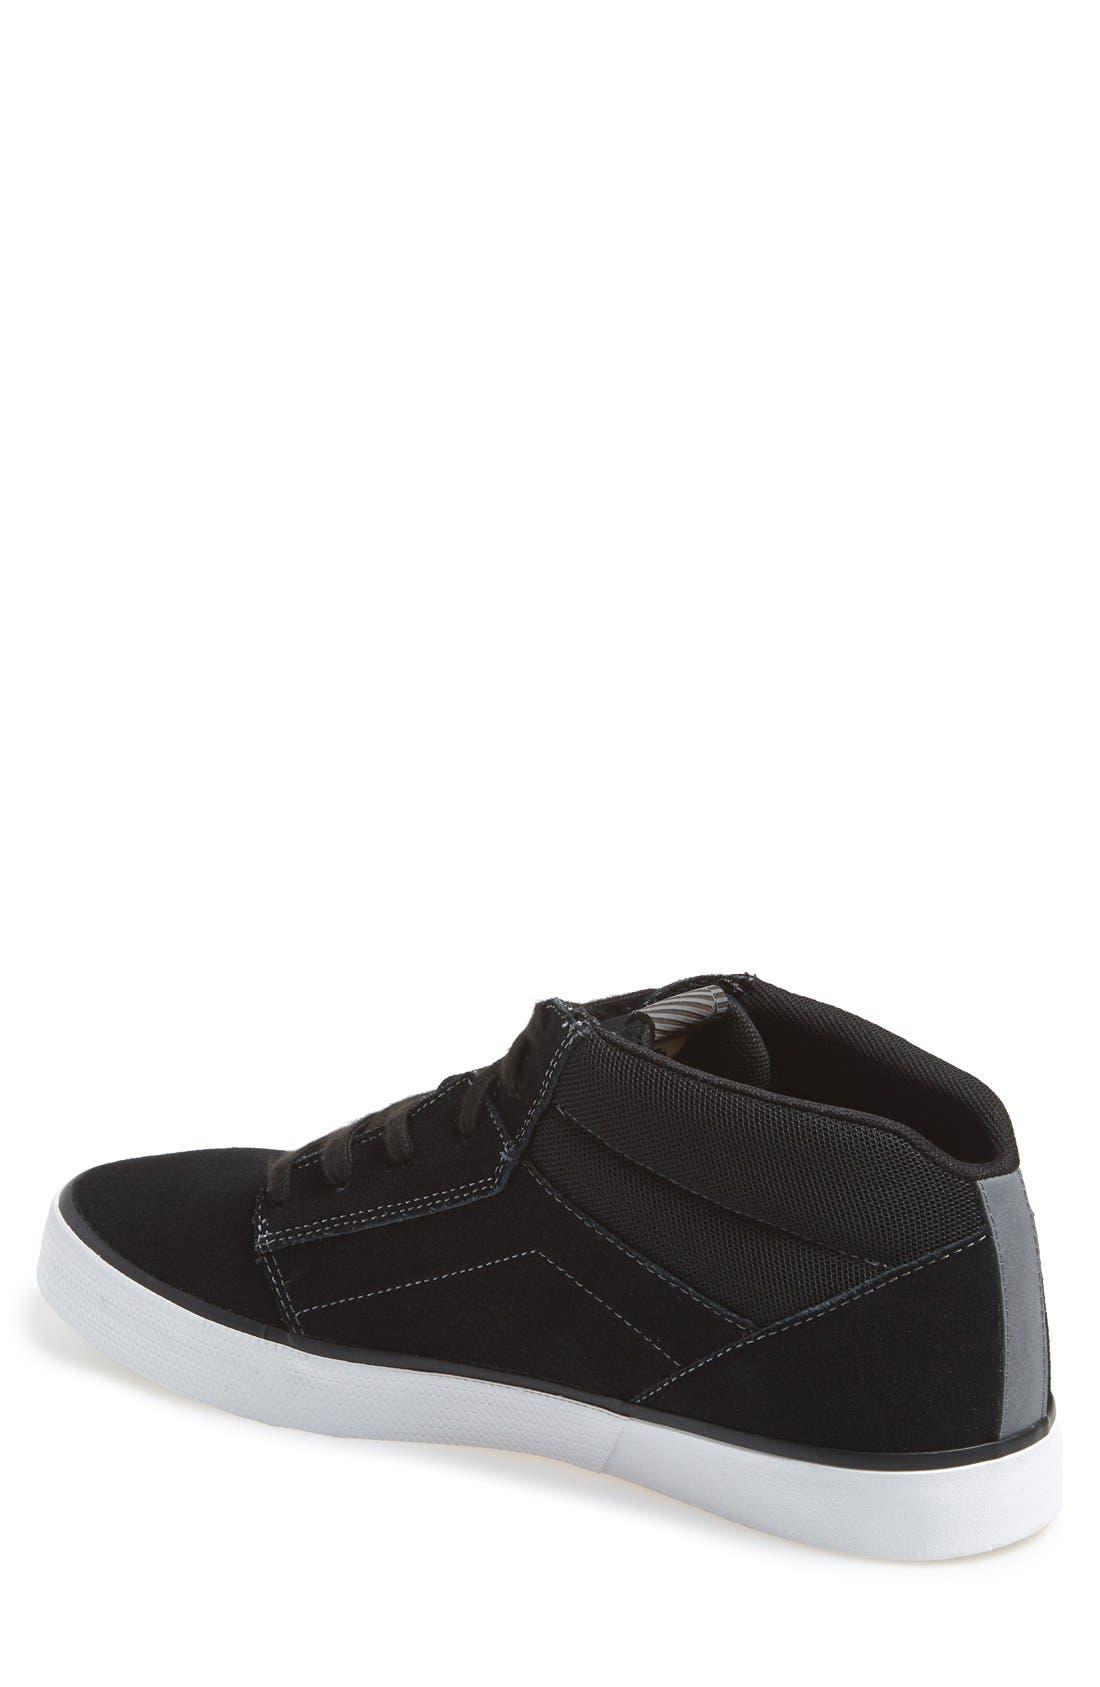 'Grimm Mid 2' Sneaker,                             Alternate thumbnail 4, color,                             018